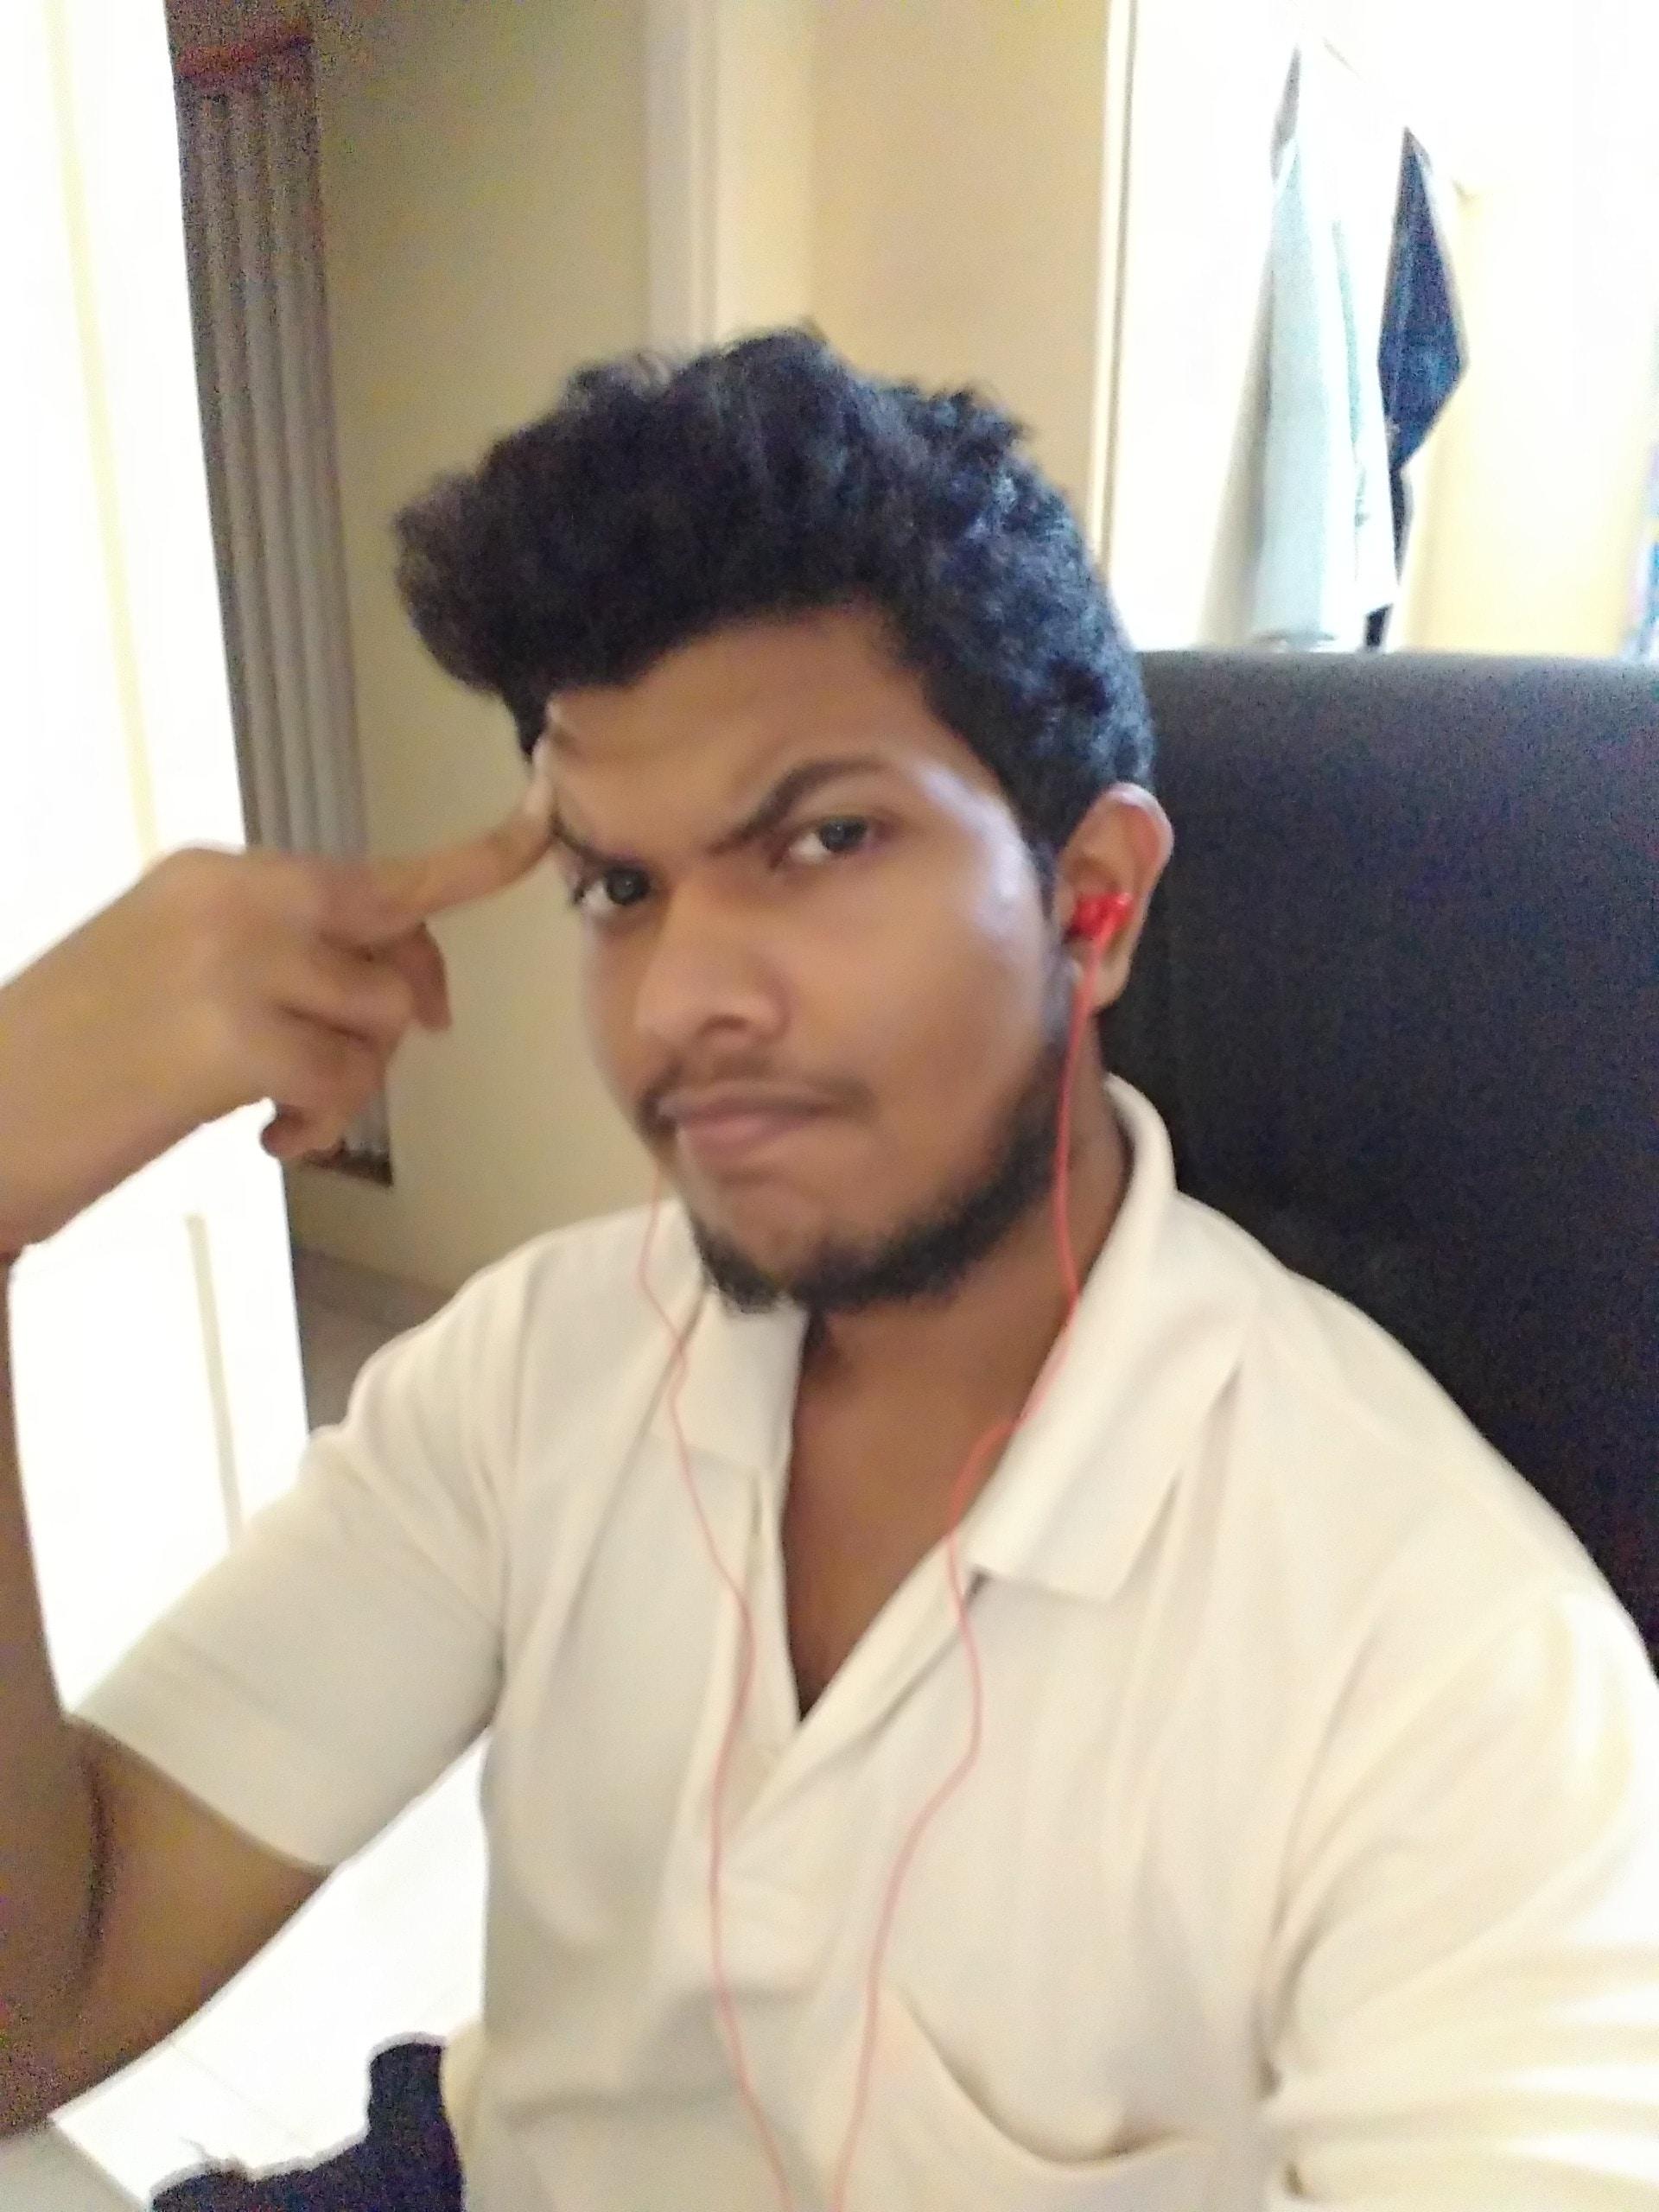 Go to VISAL NAIR's profile